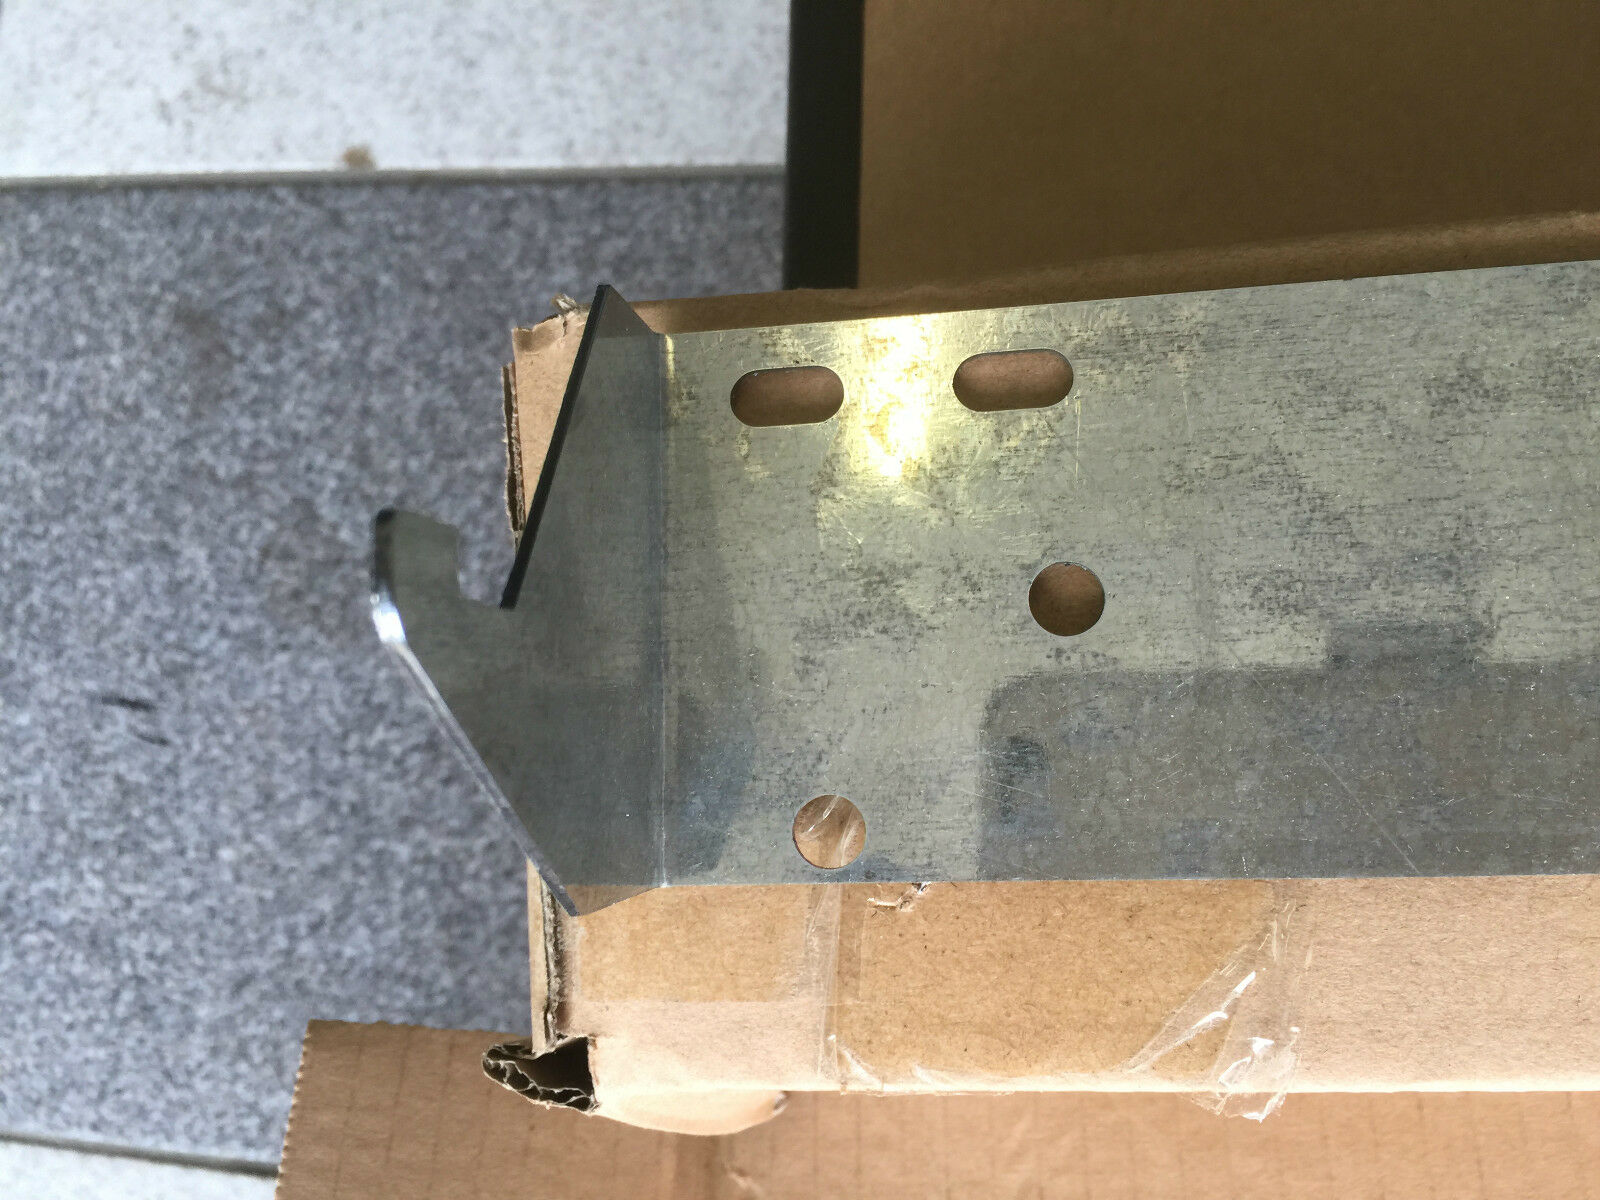 EXPRESS Westinghouse Sensor Dryer Wall Bracket Kit LD500 LD500B LD500B*00